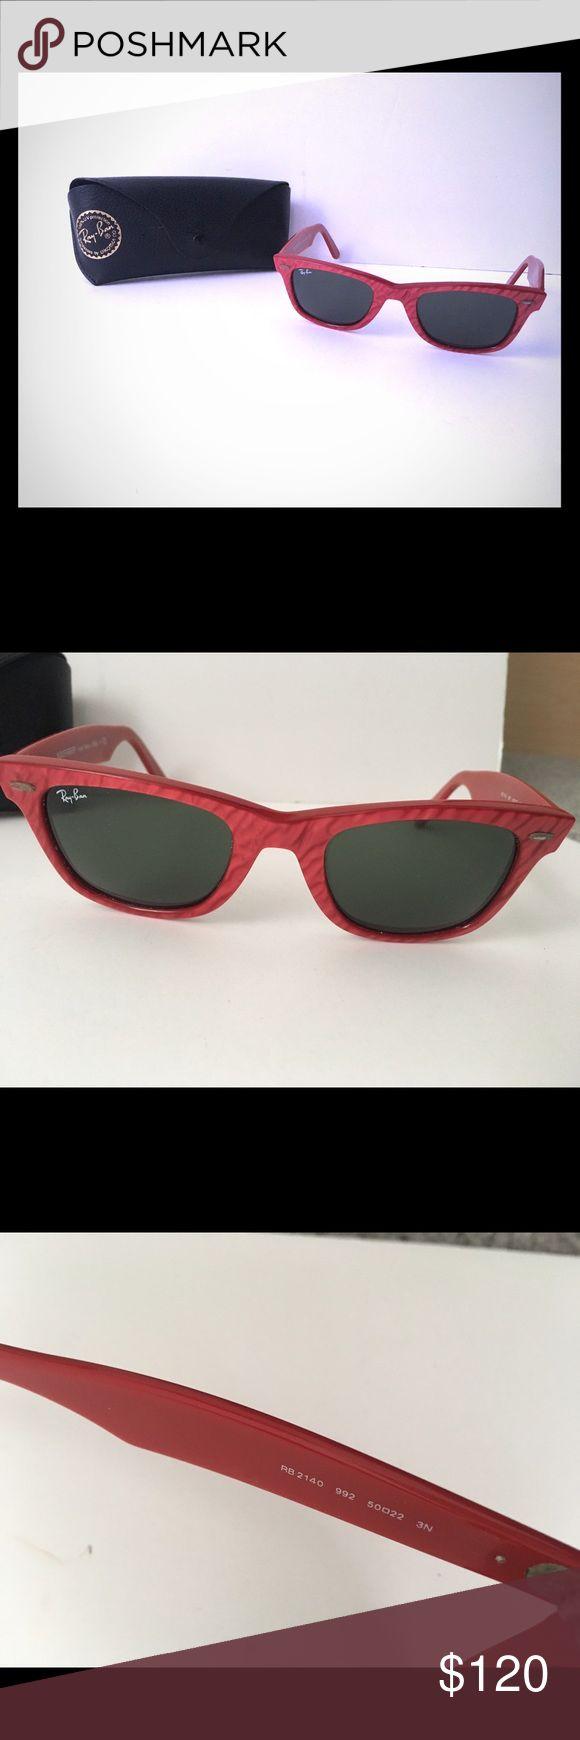 Red Wayfarer Ray Ban Sunglasses Red wayfarer sunglasses. With case. Ray-Ban Accessories Sunglasses